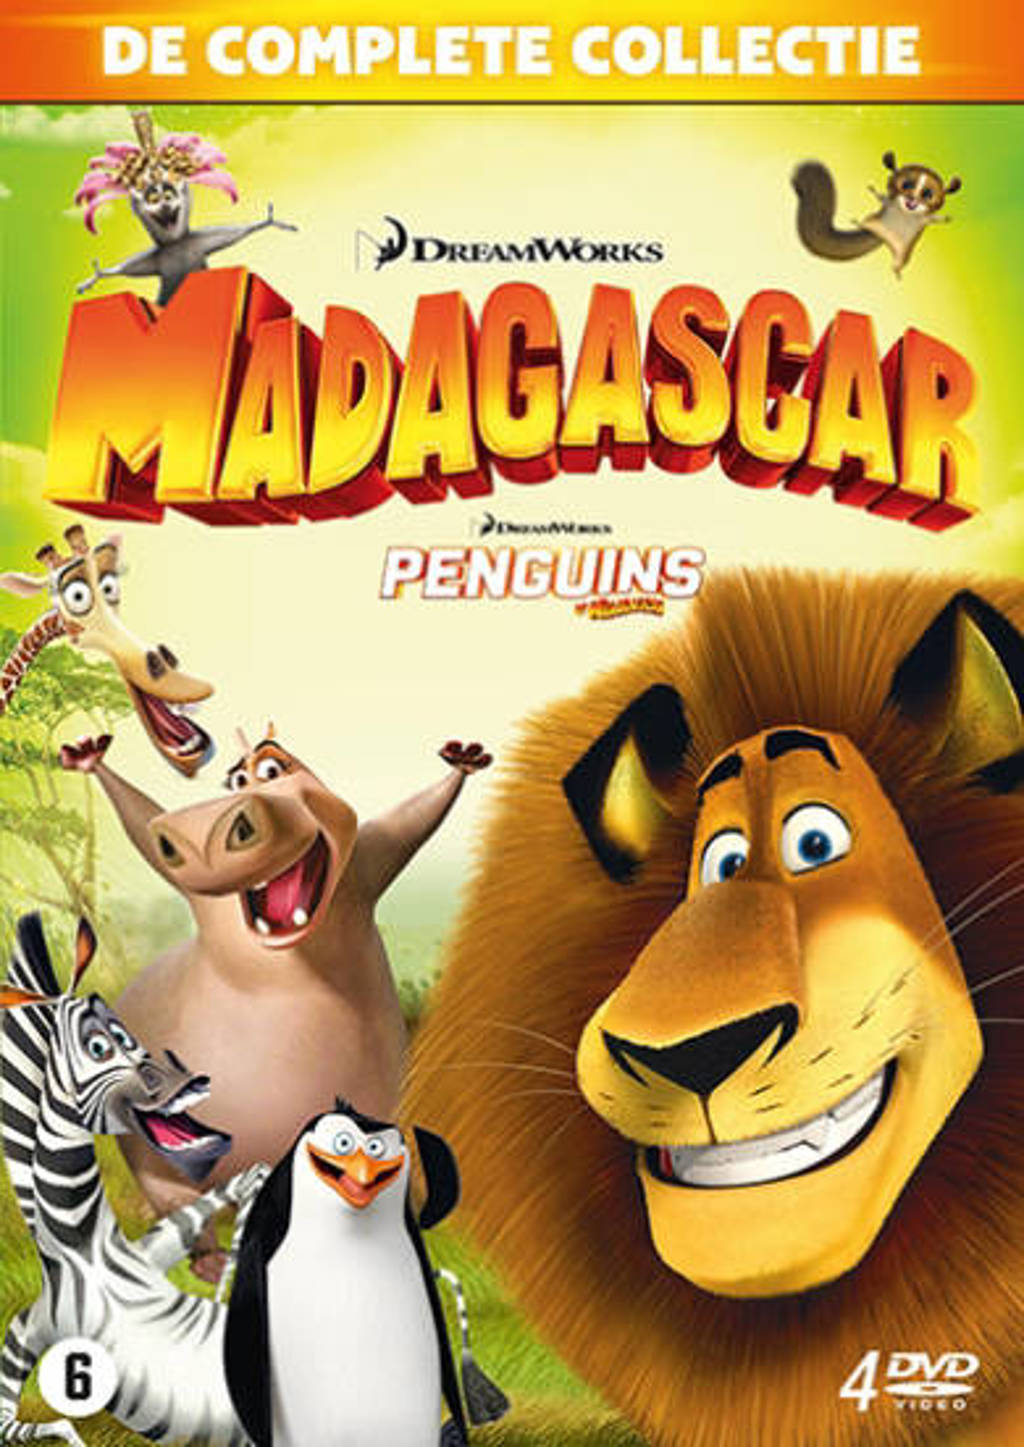 Madagascar 1-3 + Penguins (DVD)